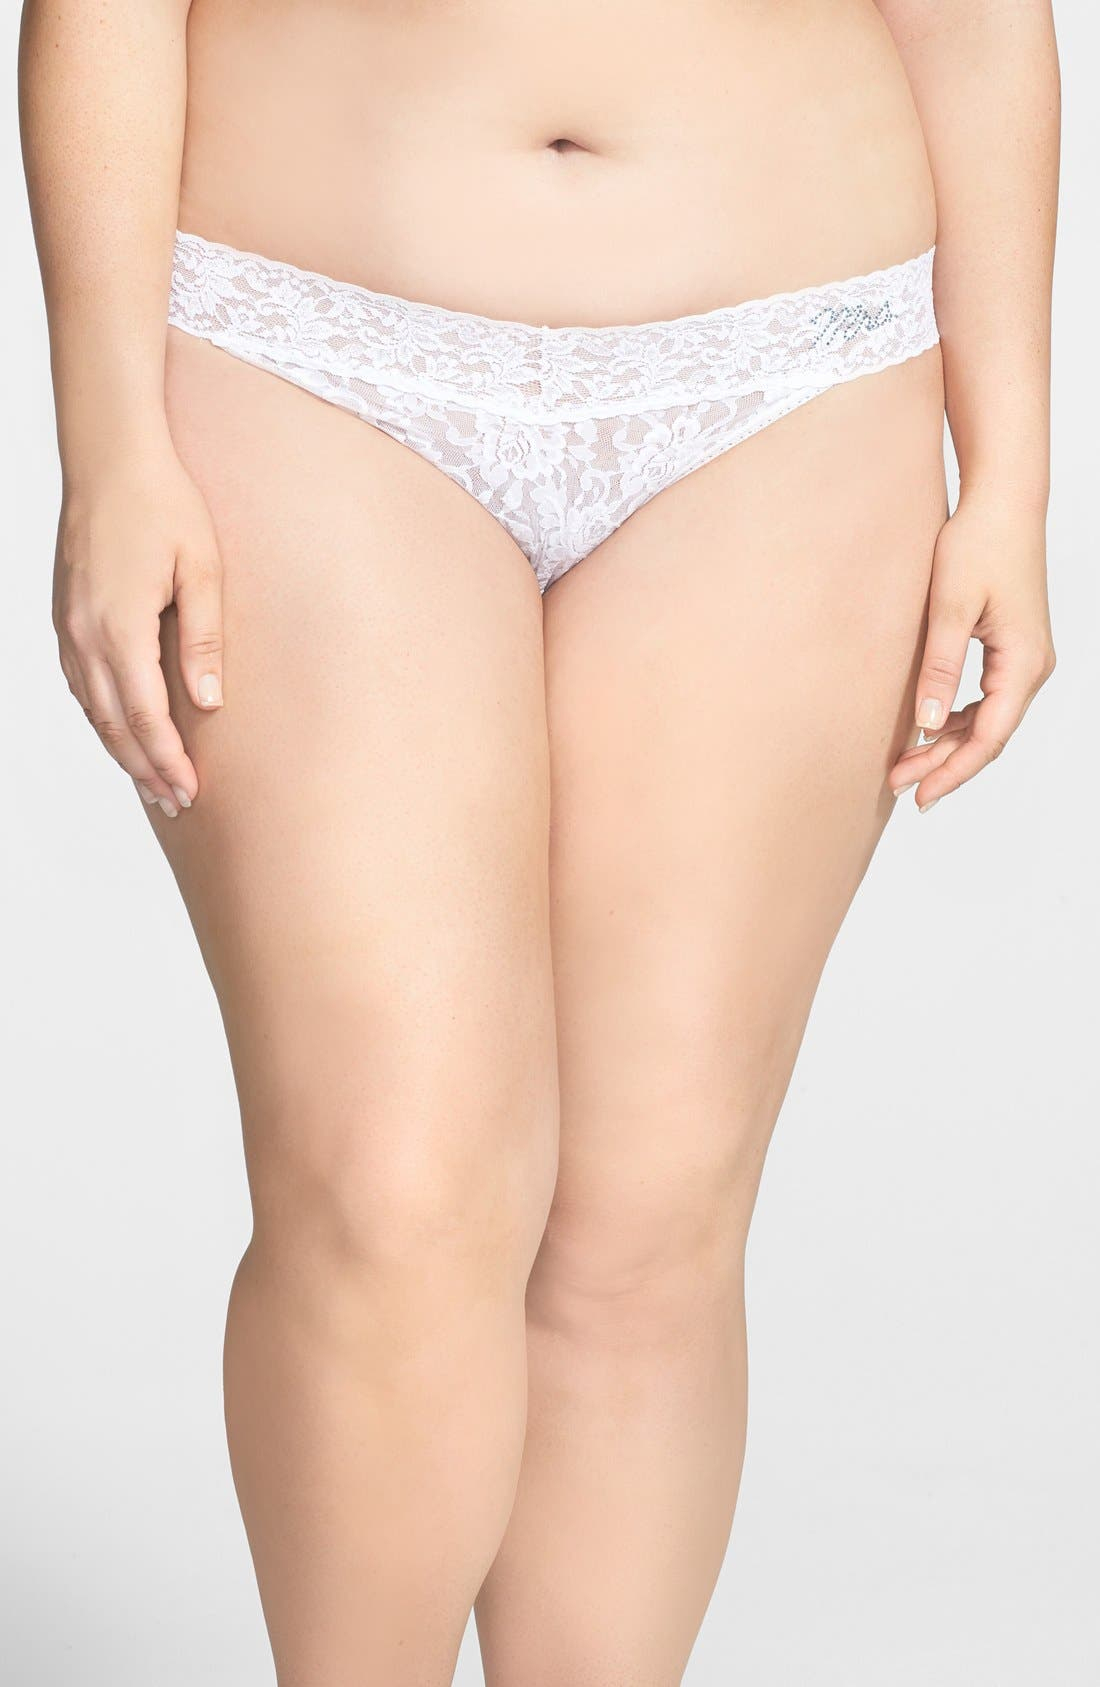 Alternate Image 1 Selected - Hanky Panky 'Signature Lace - Mrs.' Regular Rise Thong (Plus Size)